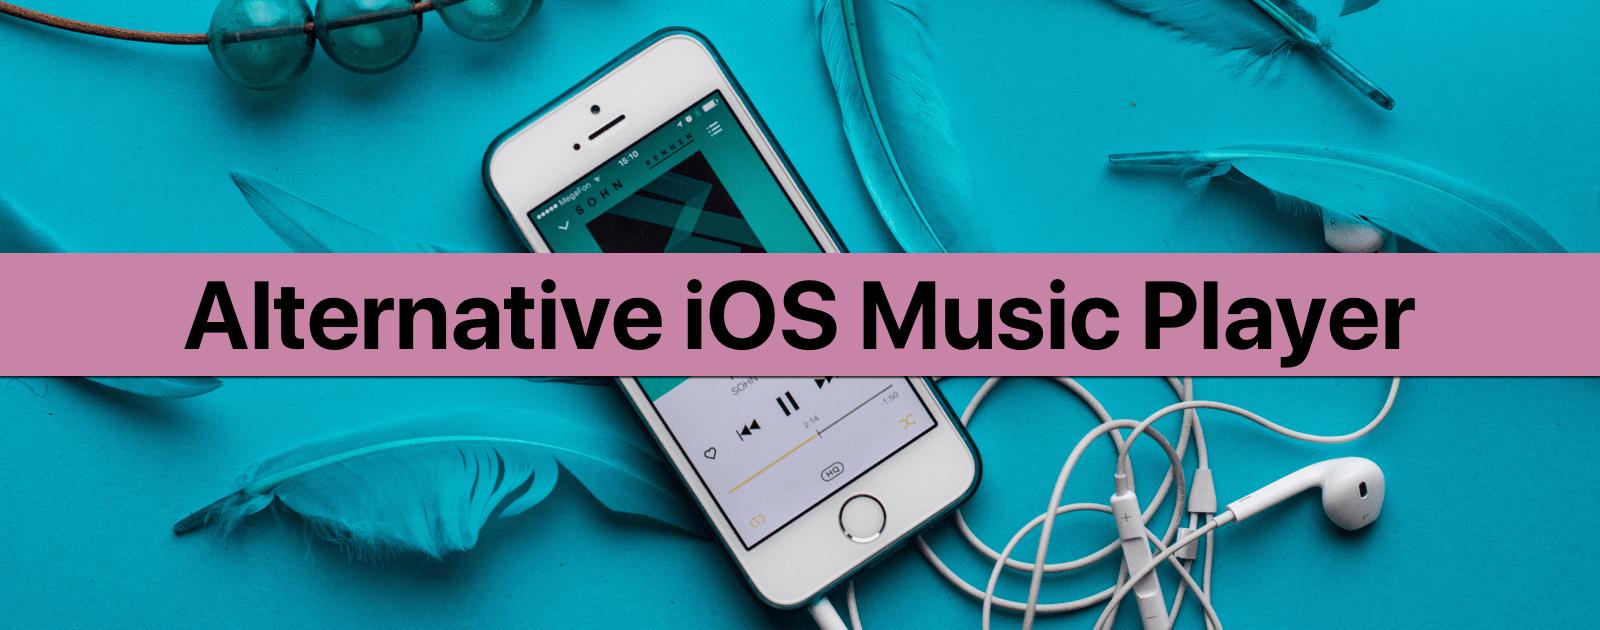 Doppler Music Player is an Alternative Music App for iOS